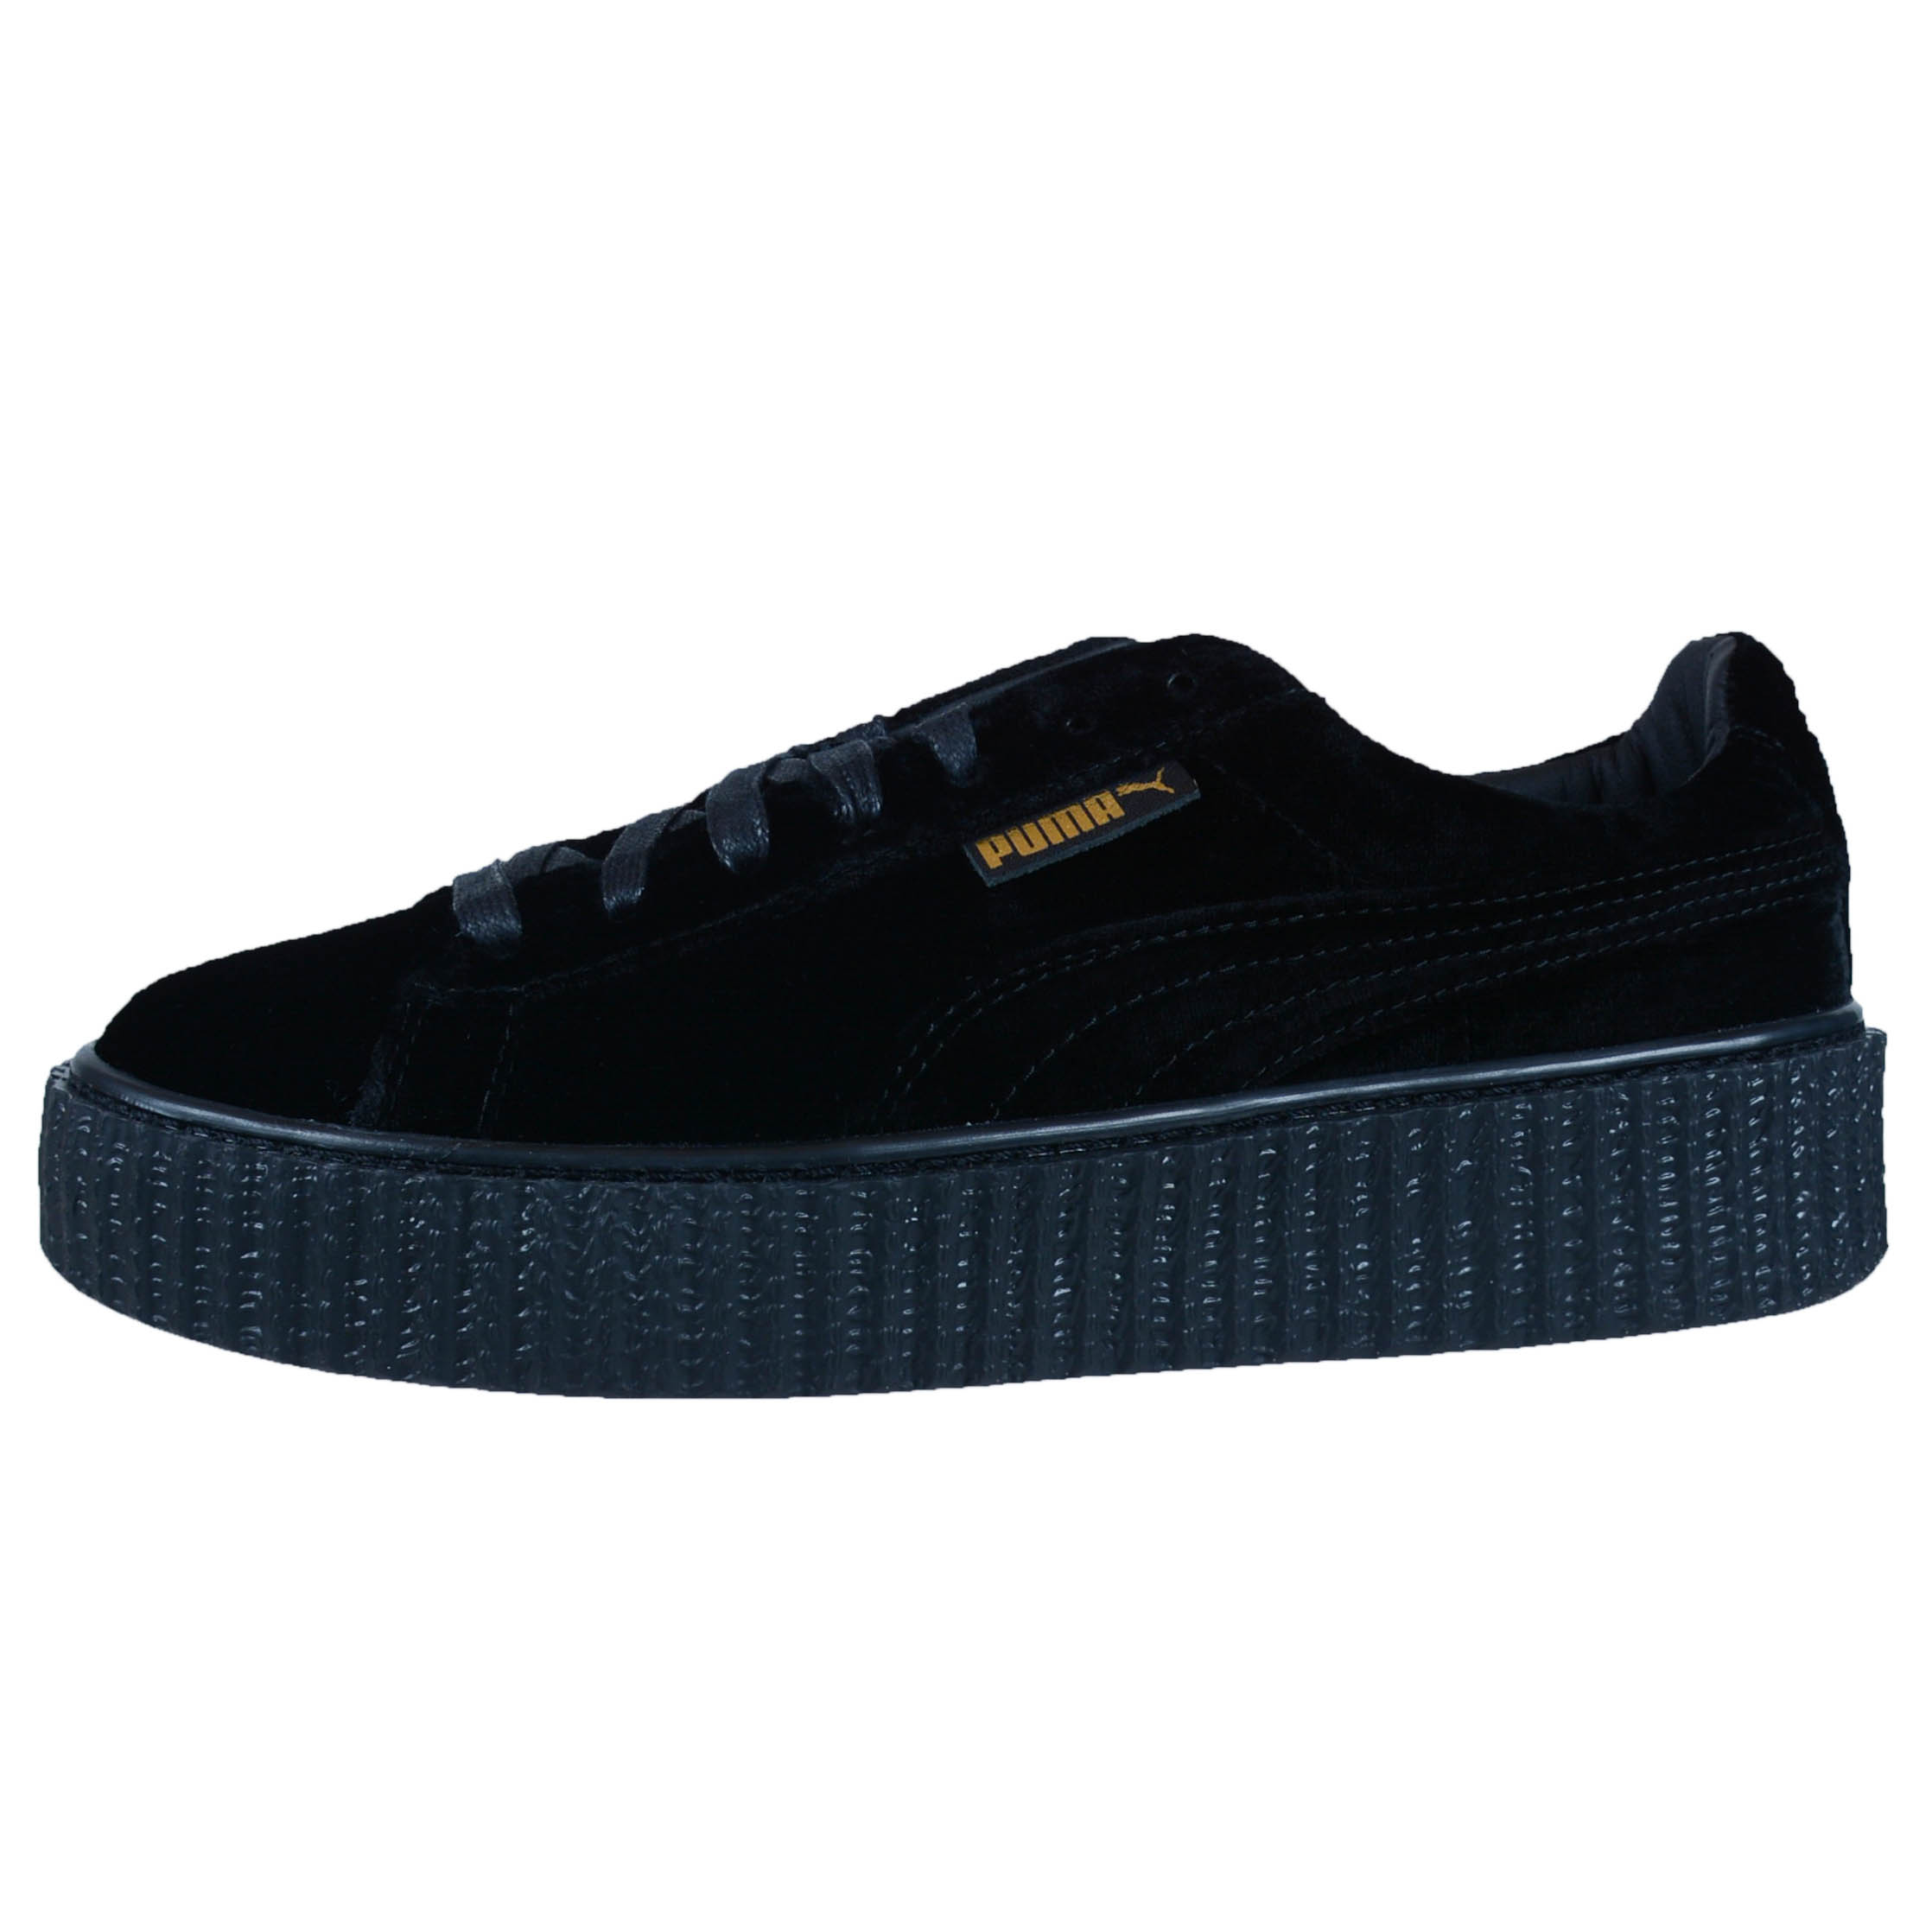 b0de1ea64bb1 puma black on black on sale   OFF79% Discounts